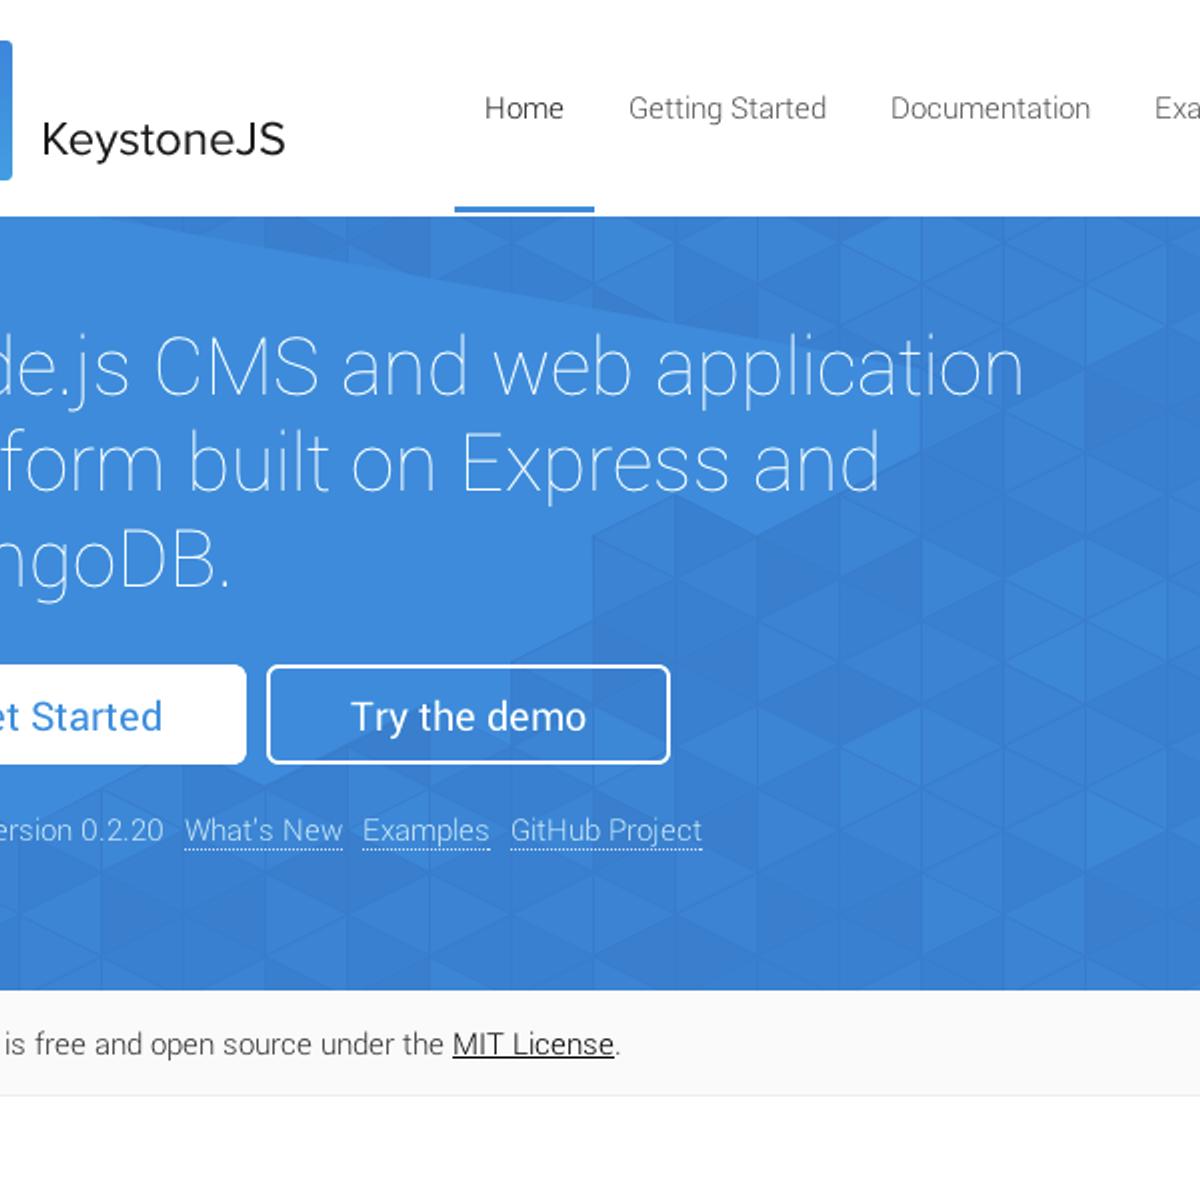 Keystonejs Alternatives And Similar Websites And Apps